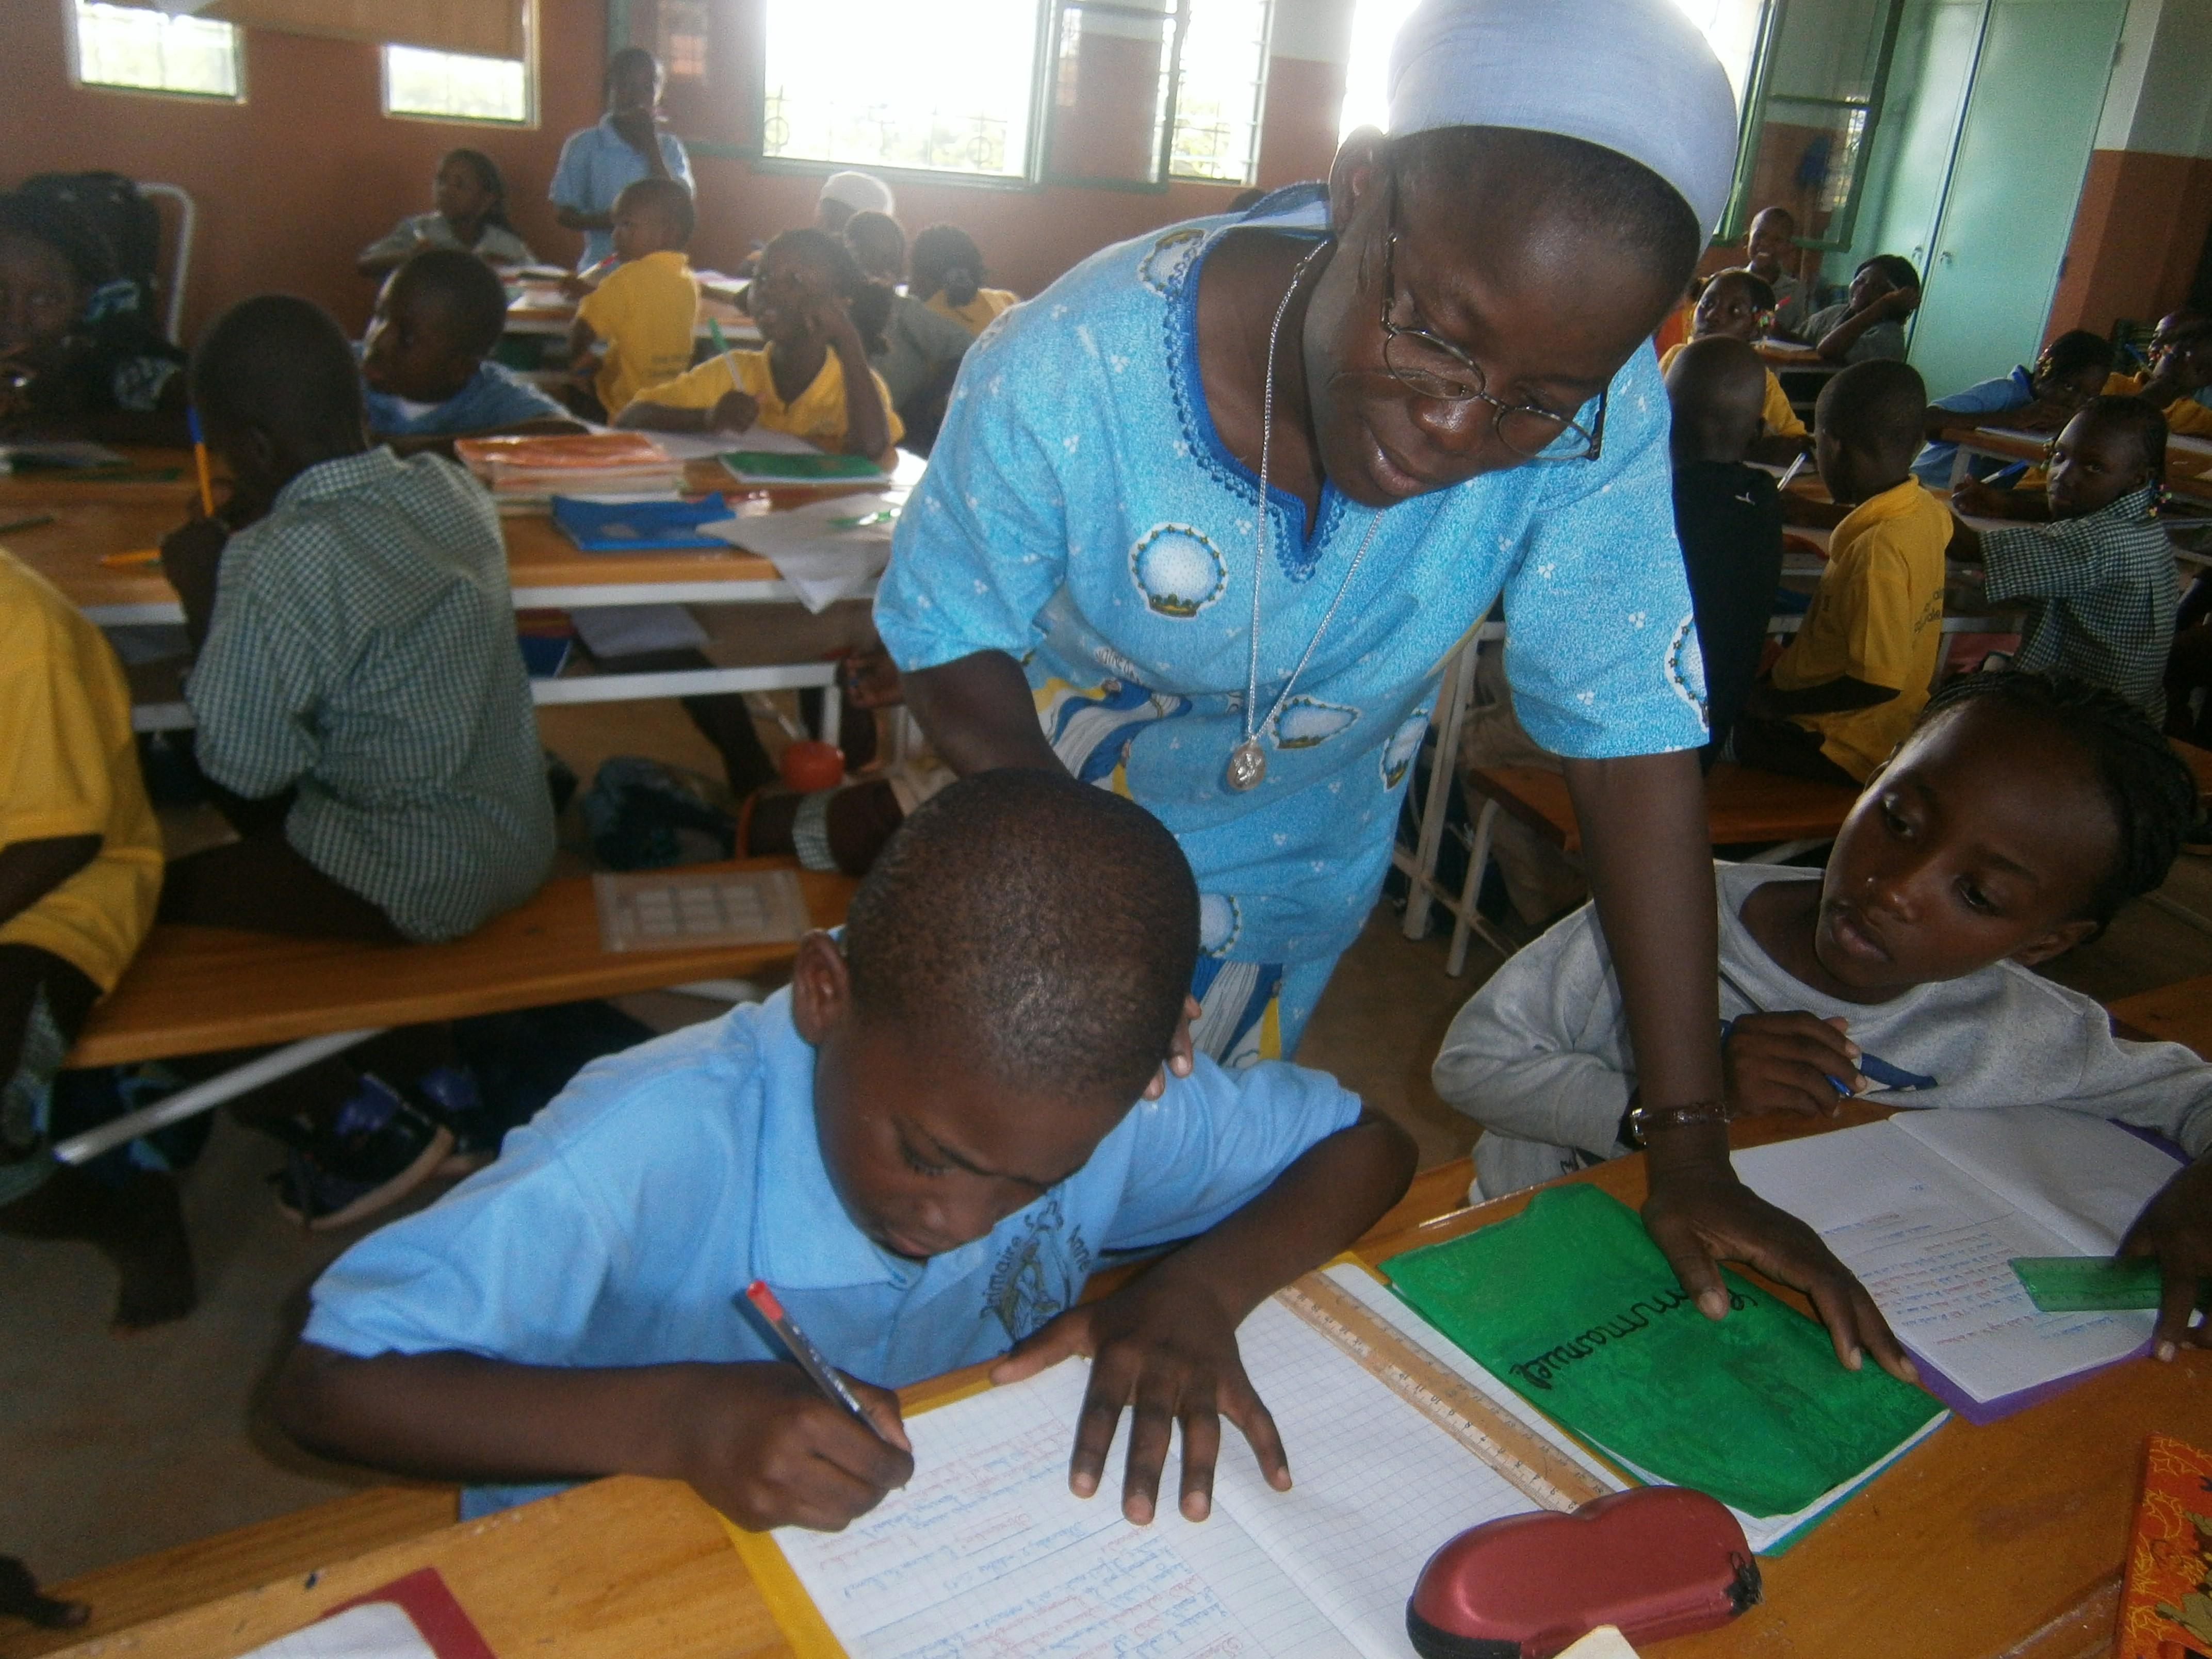 29_Soeur africaine continuant l'oeuvre apostolique